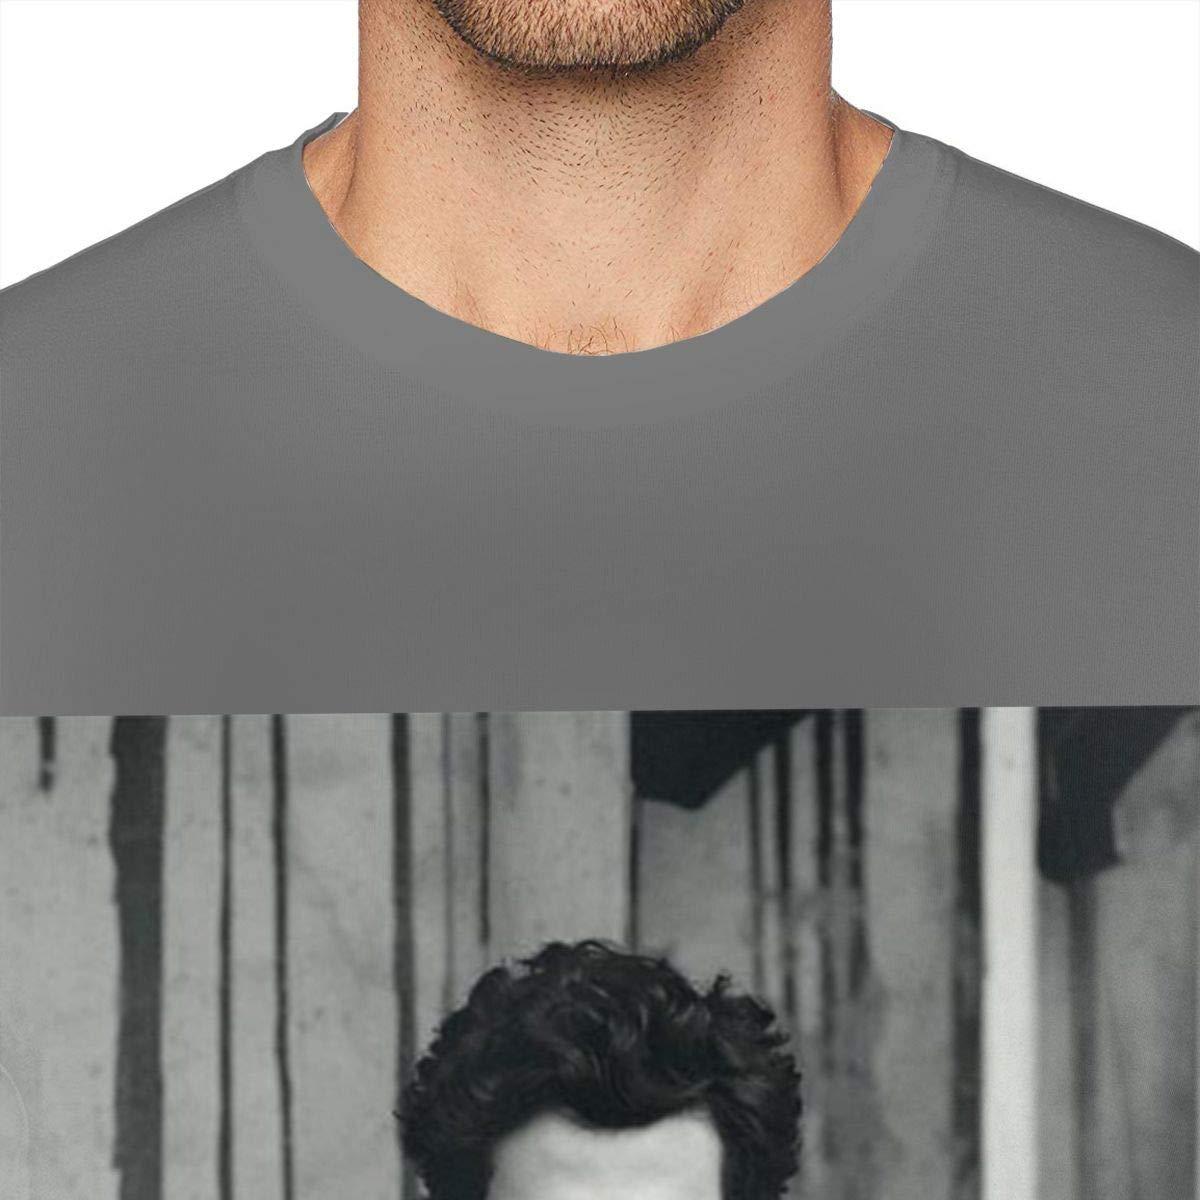 UP-ARP Mens So Bad-Gesaffelstein Tee T-Shirt Black